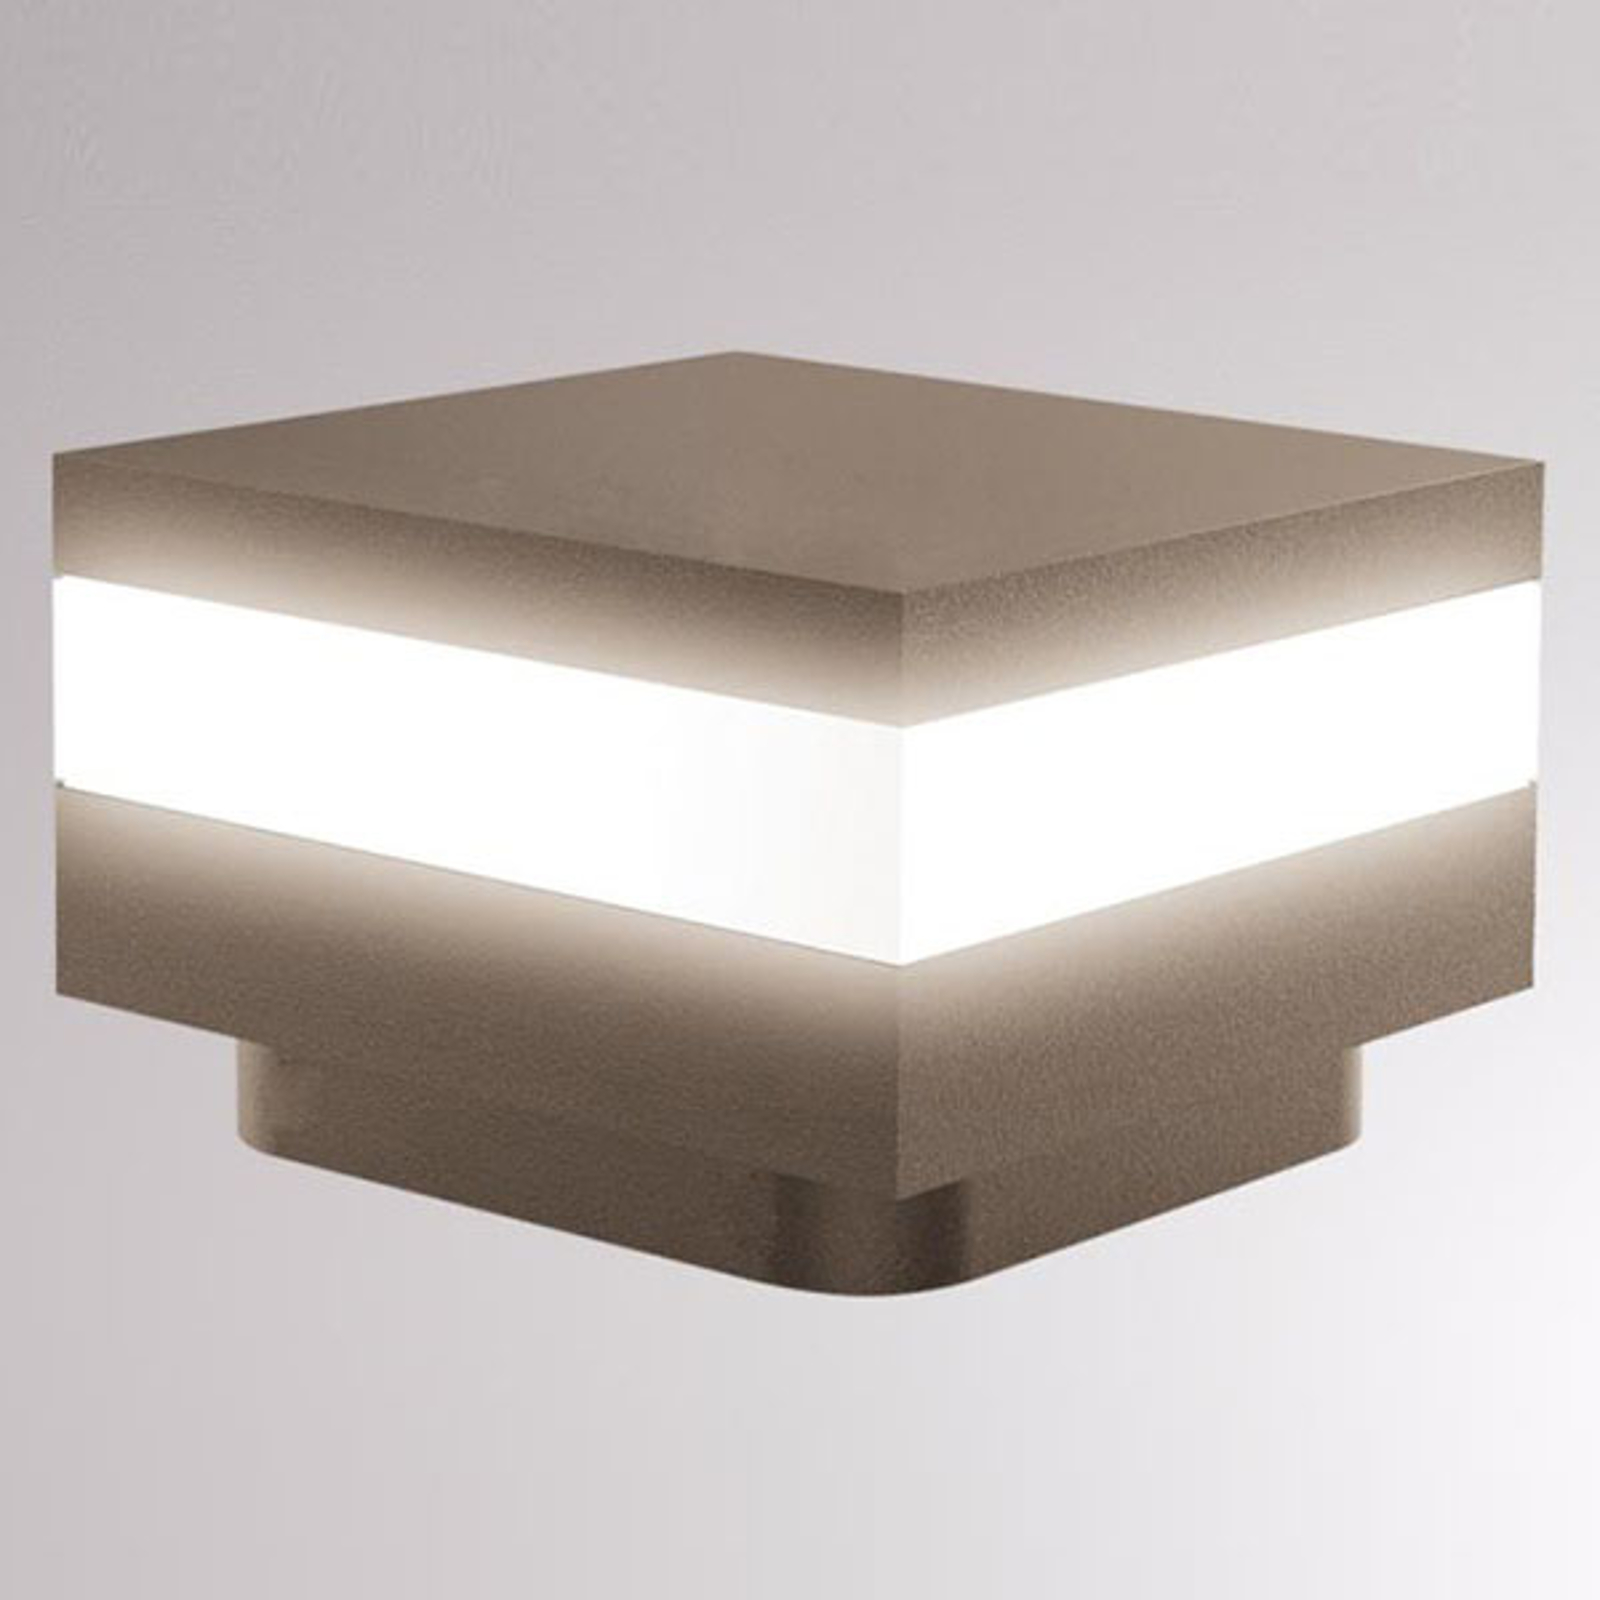 LOUM Mash słupek oświetleniowy LED IP65 terra